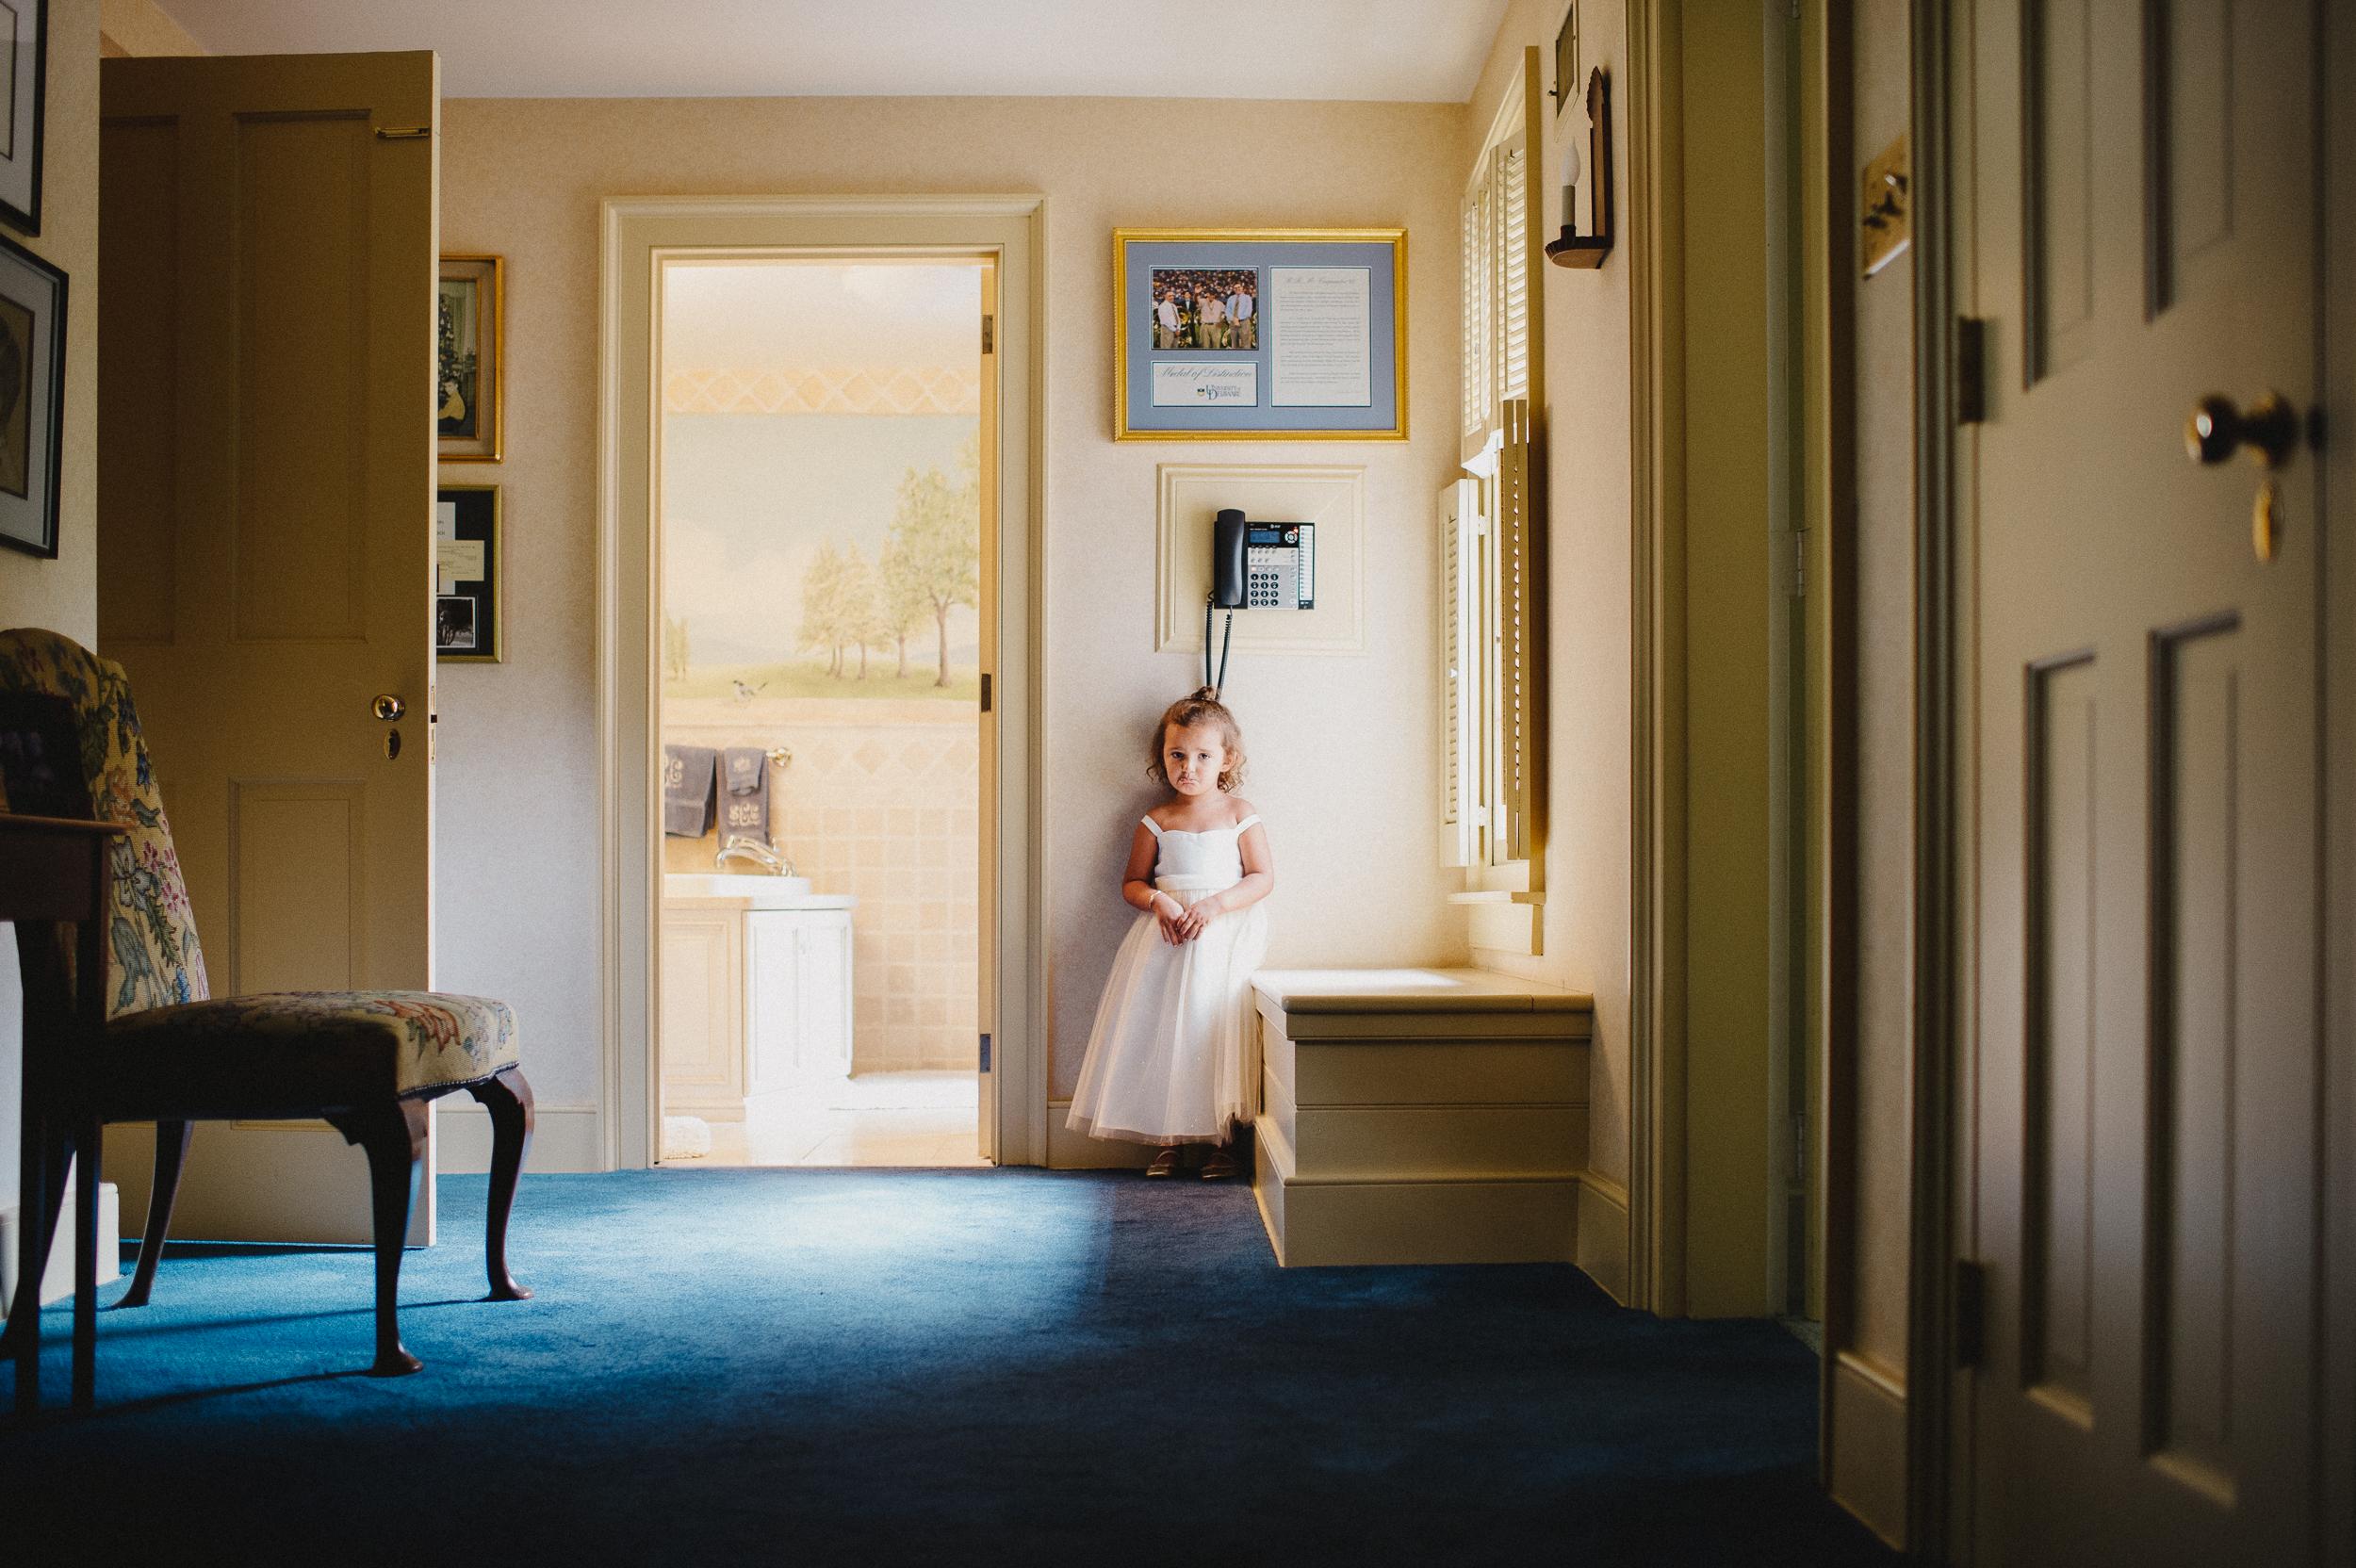 delaware-estate-wedding-photographer-pat-robinson-photography-24.jpg